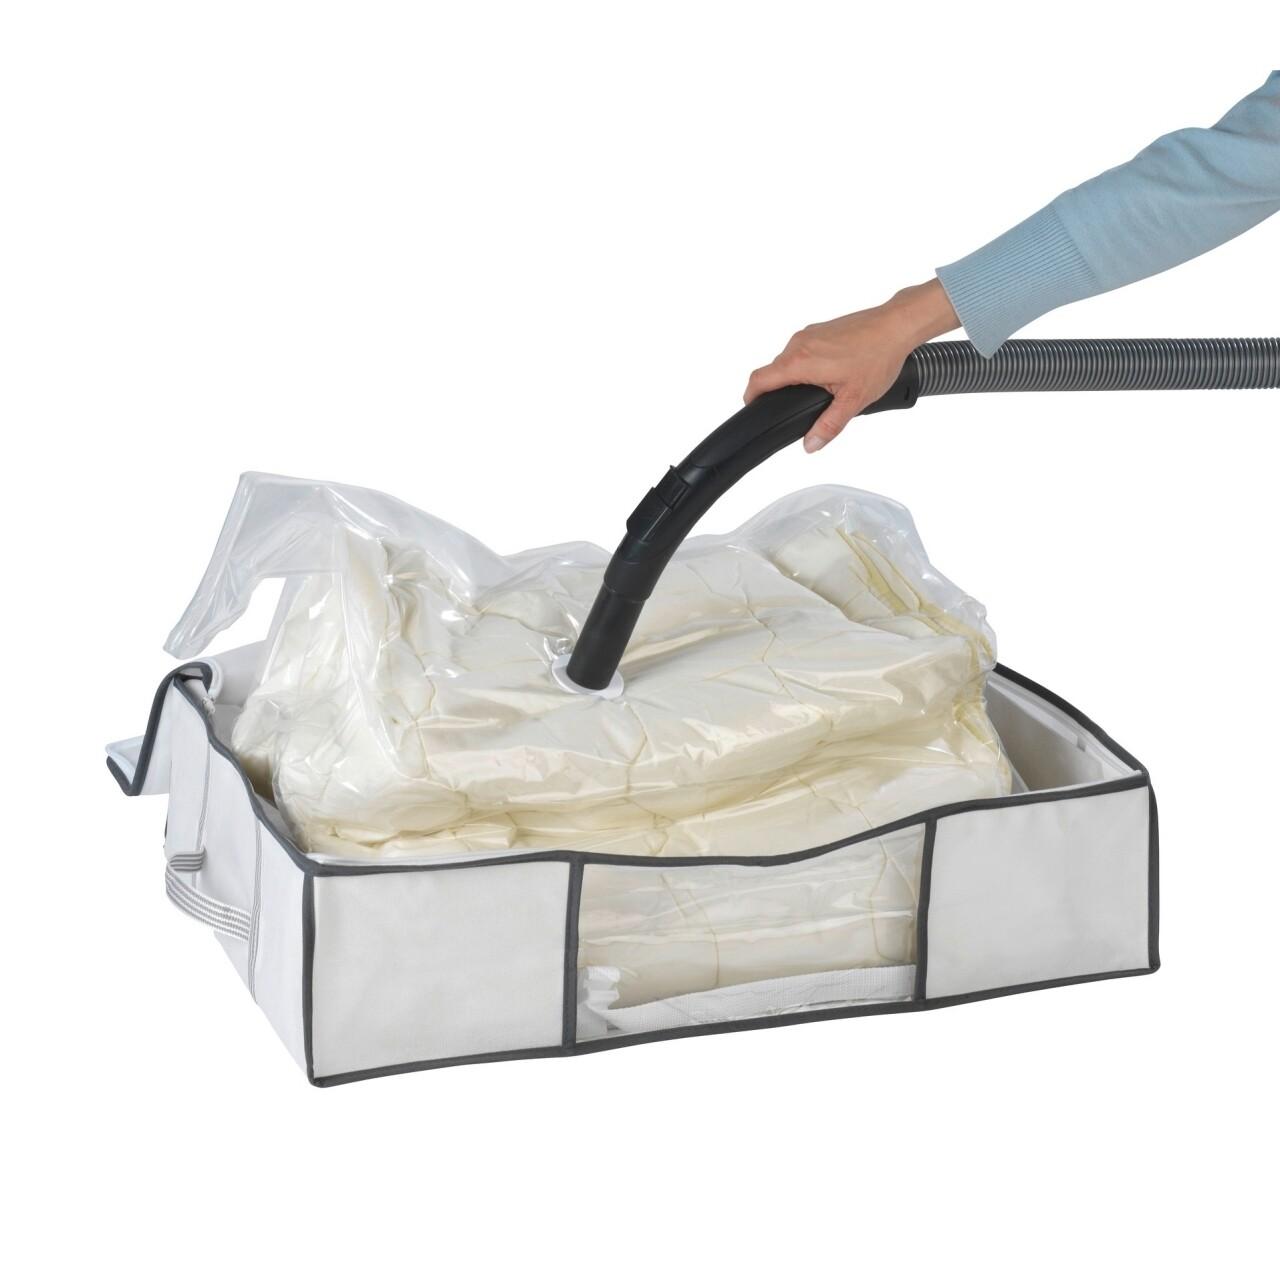 Cutie cu sac pentru vidat Vacuum Soft Box, Wenko, 65x50x15 cm, polipropilena/ polietilena, alb